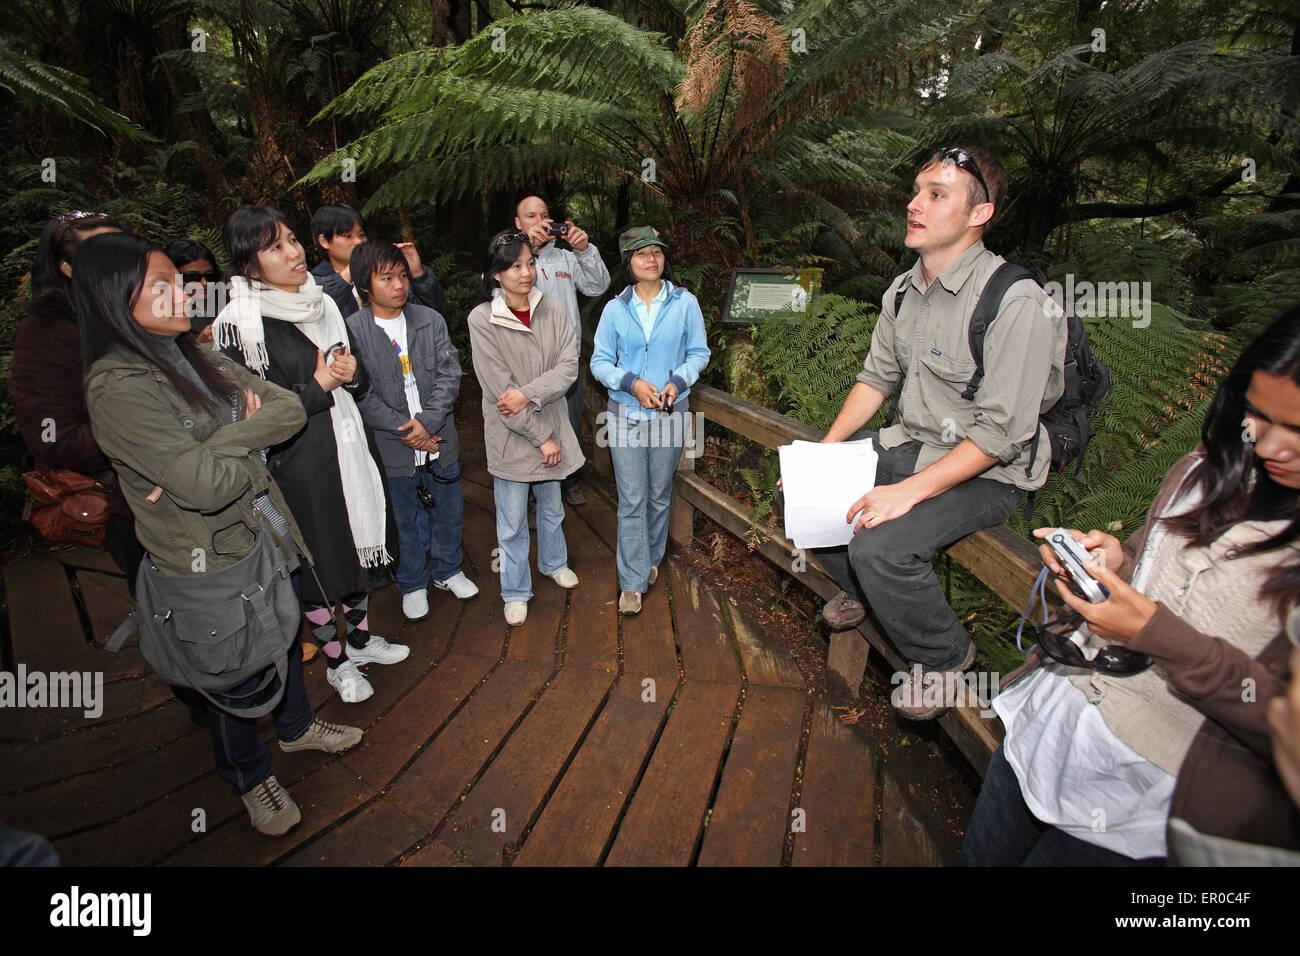 Tour guide at Maits Rest Rainforest Walk. The Otway's, Victoria, Australia. - Stock Image